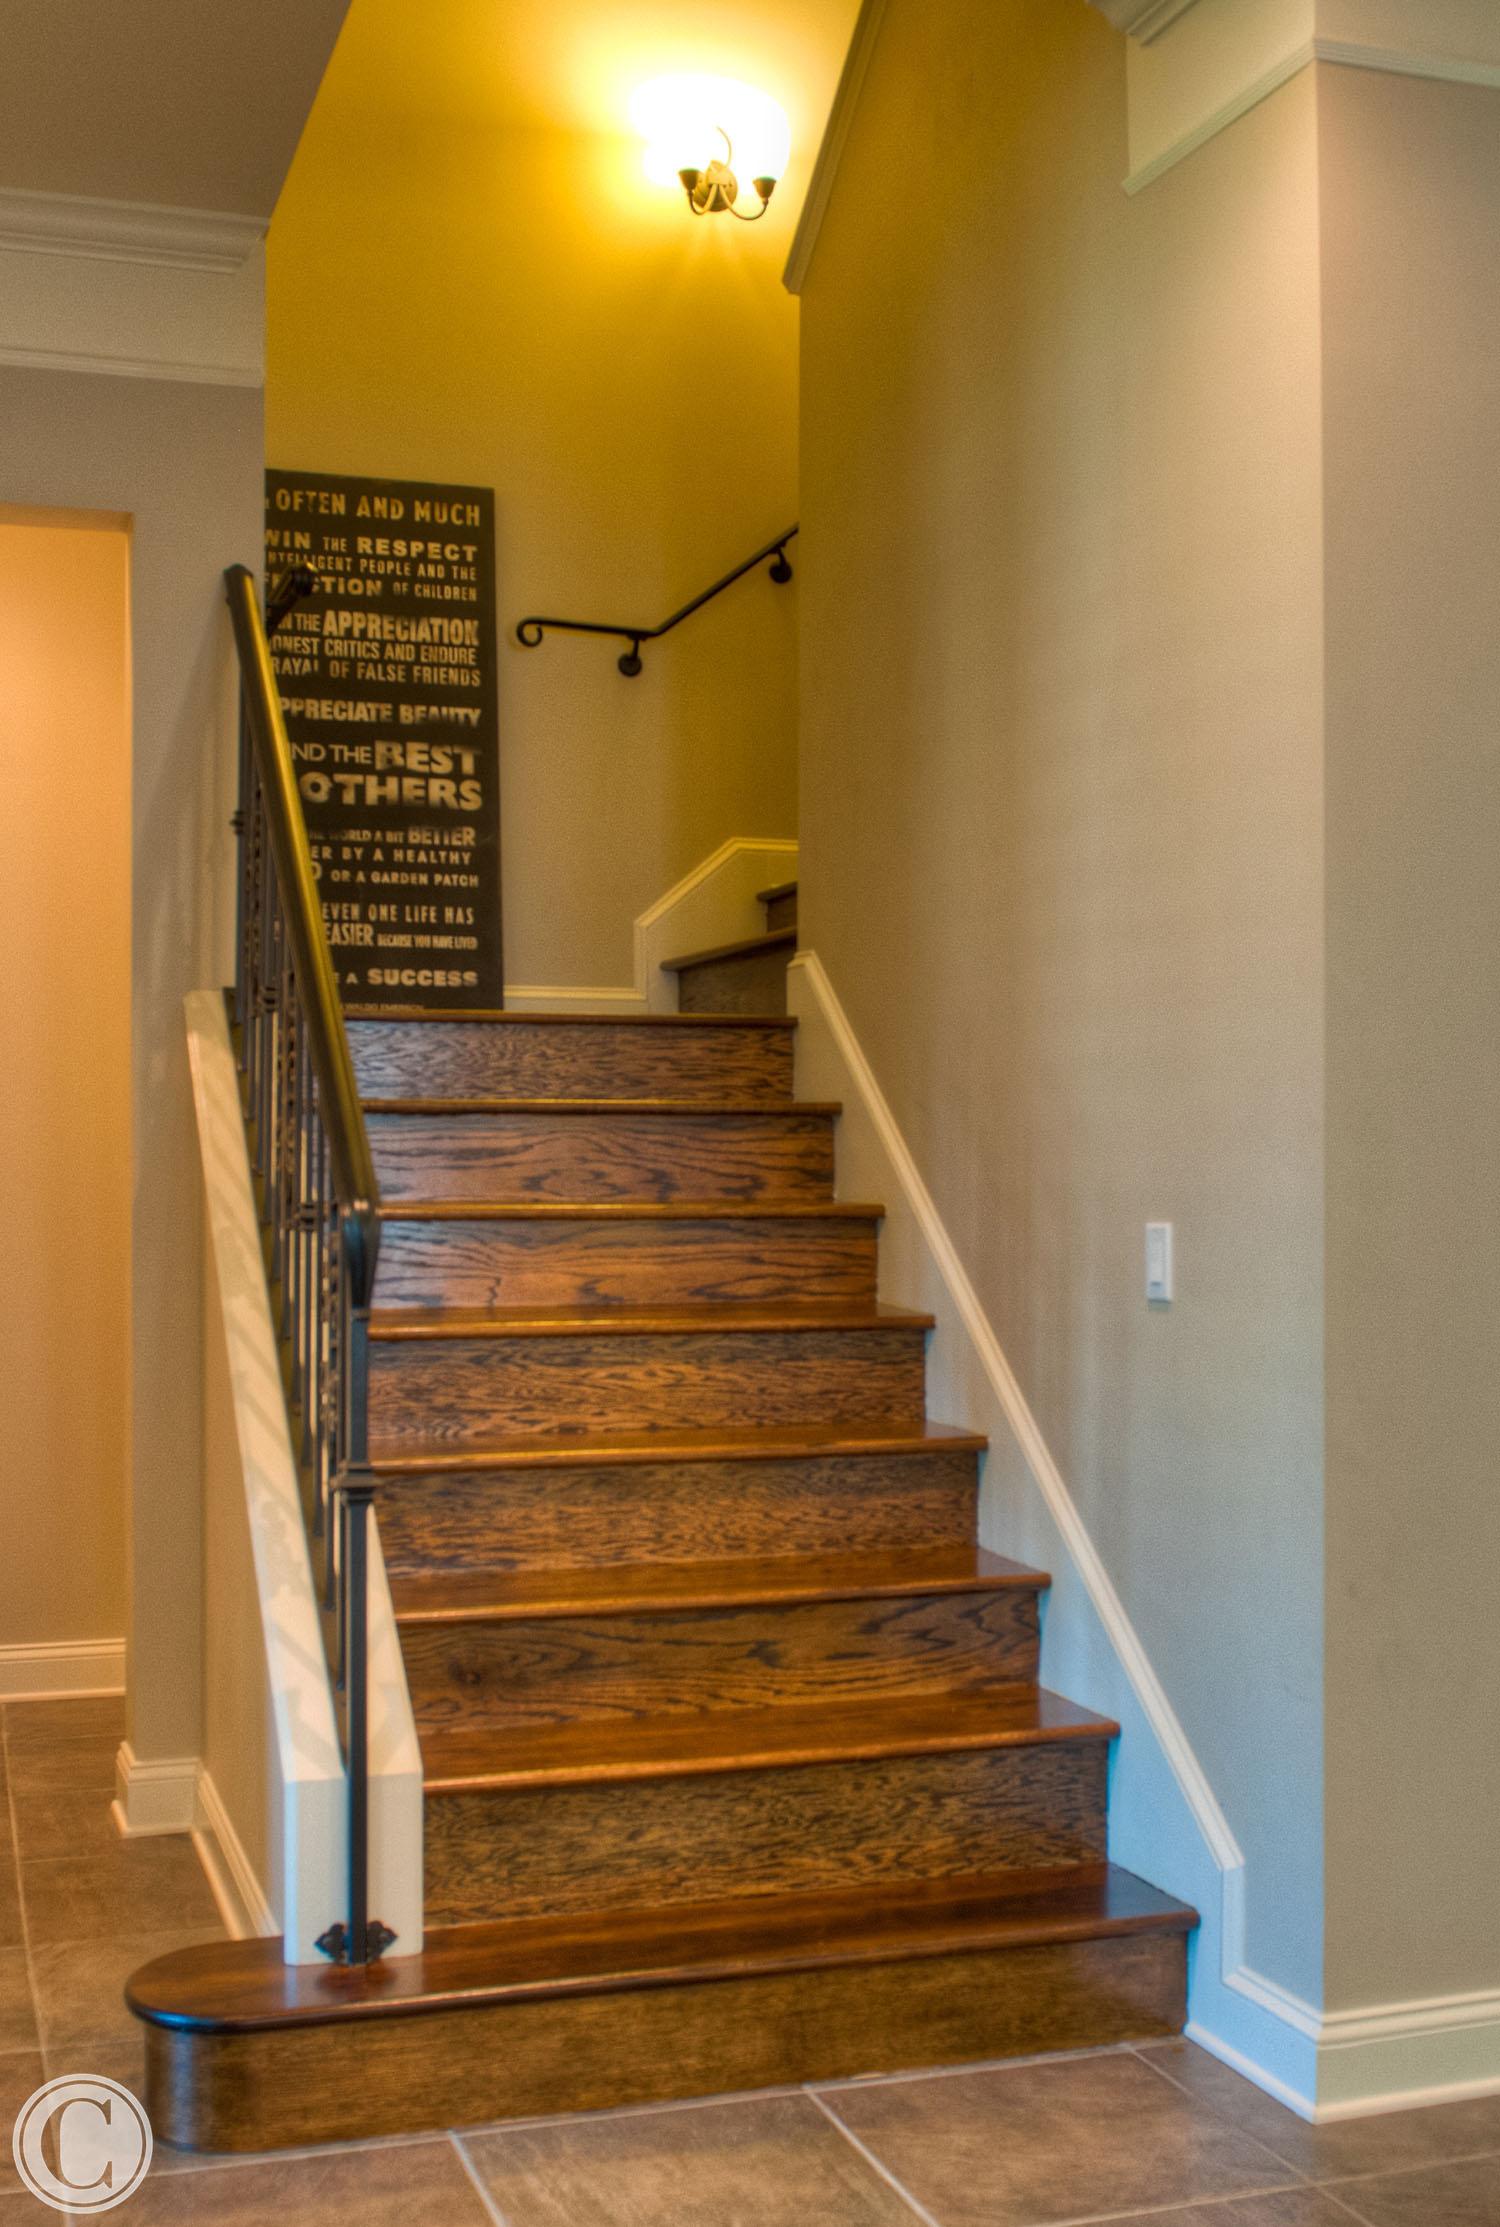 home renovation glen kernan jacksonville fl kitchen remodel jacksonville fl Wooden Staircase remodel Glen Kernan Jacksonville Florida Mark Sain Wilson Photography